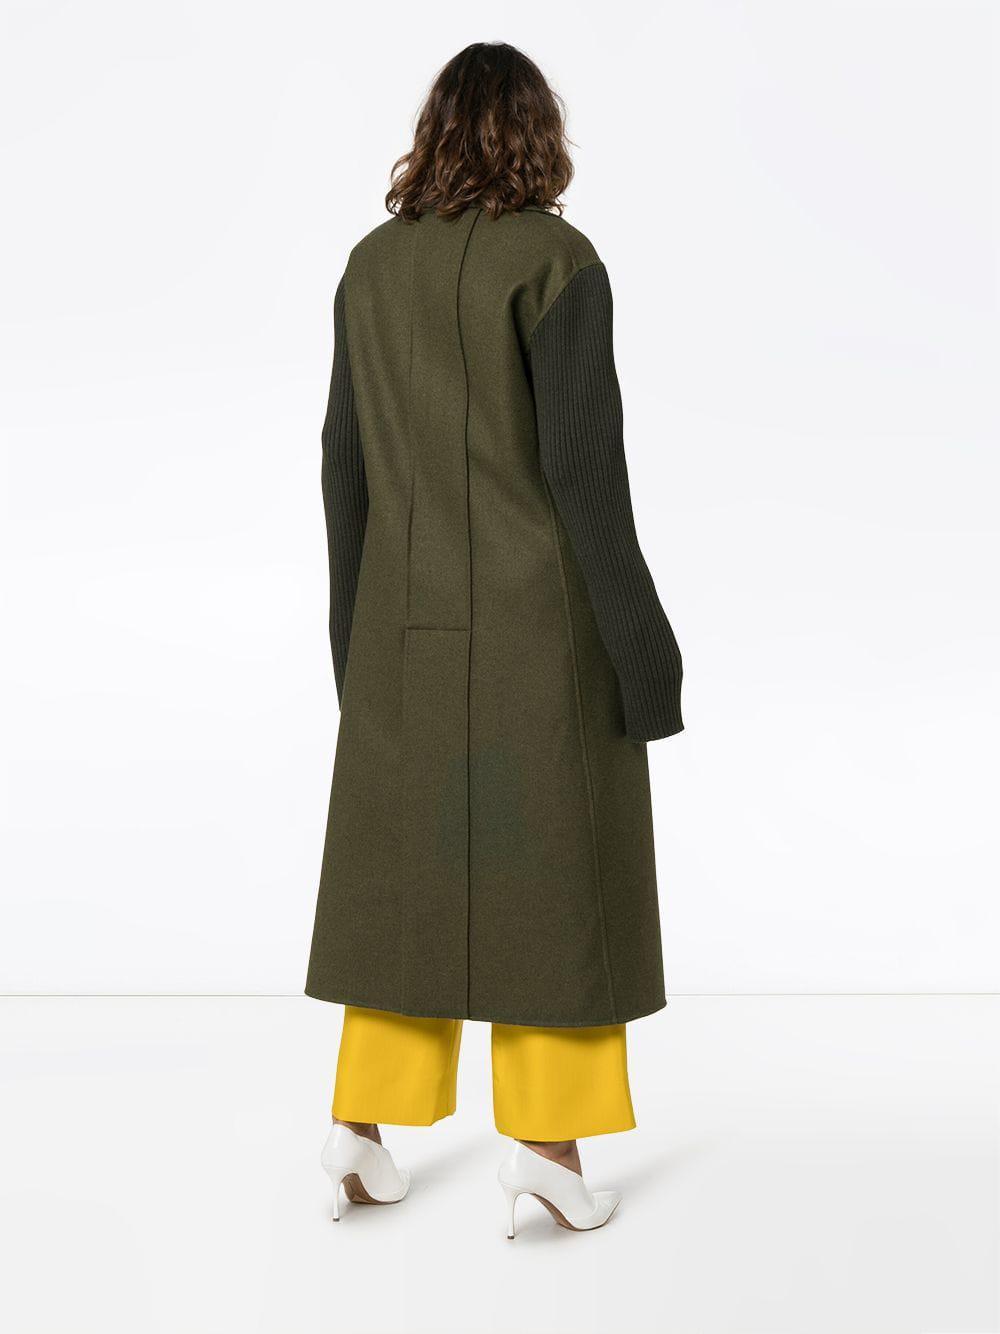 Green Coat Marni in Sleeve Lyst Wool Ribbed xpwWq8W1B7